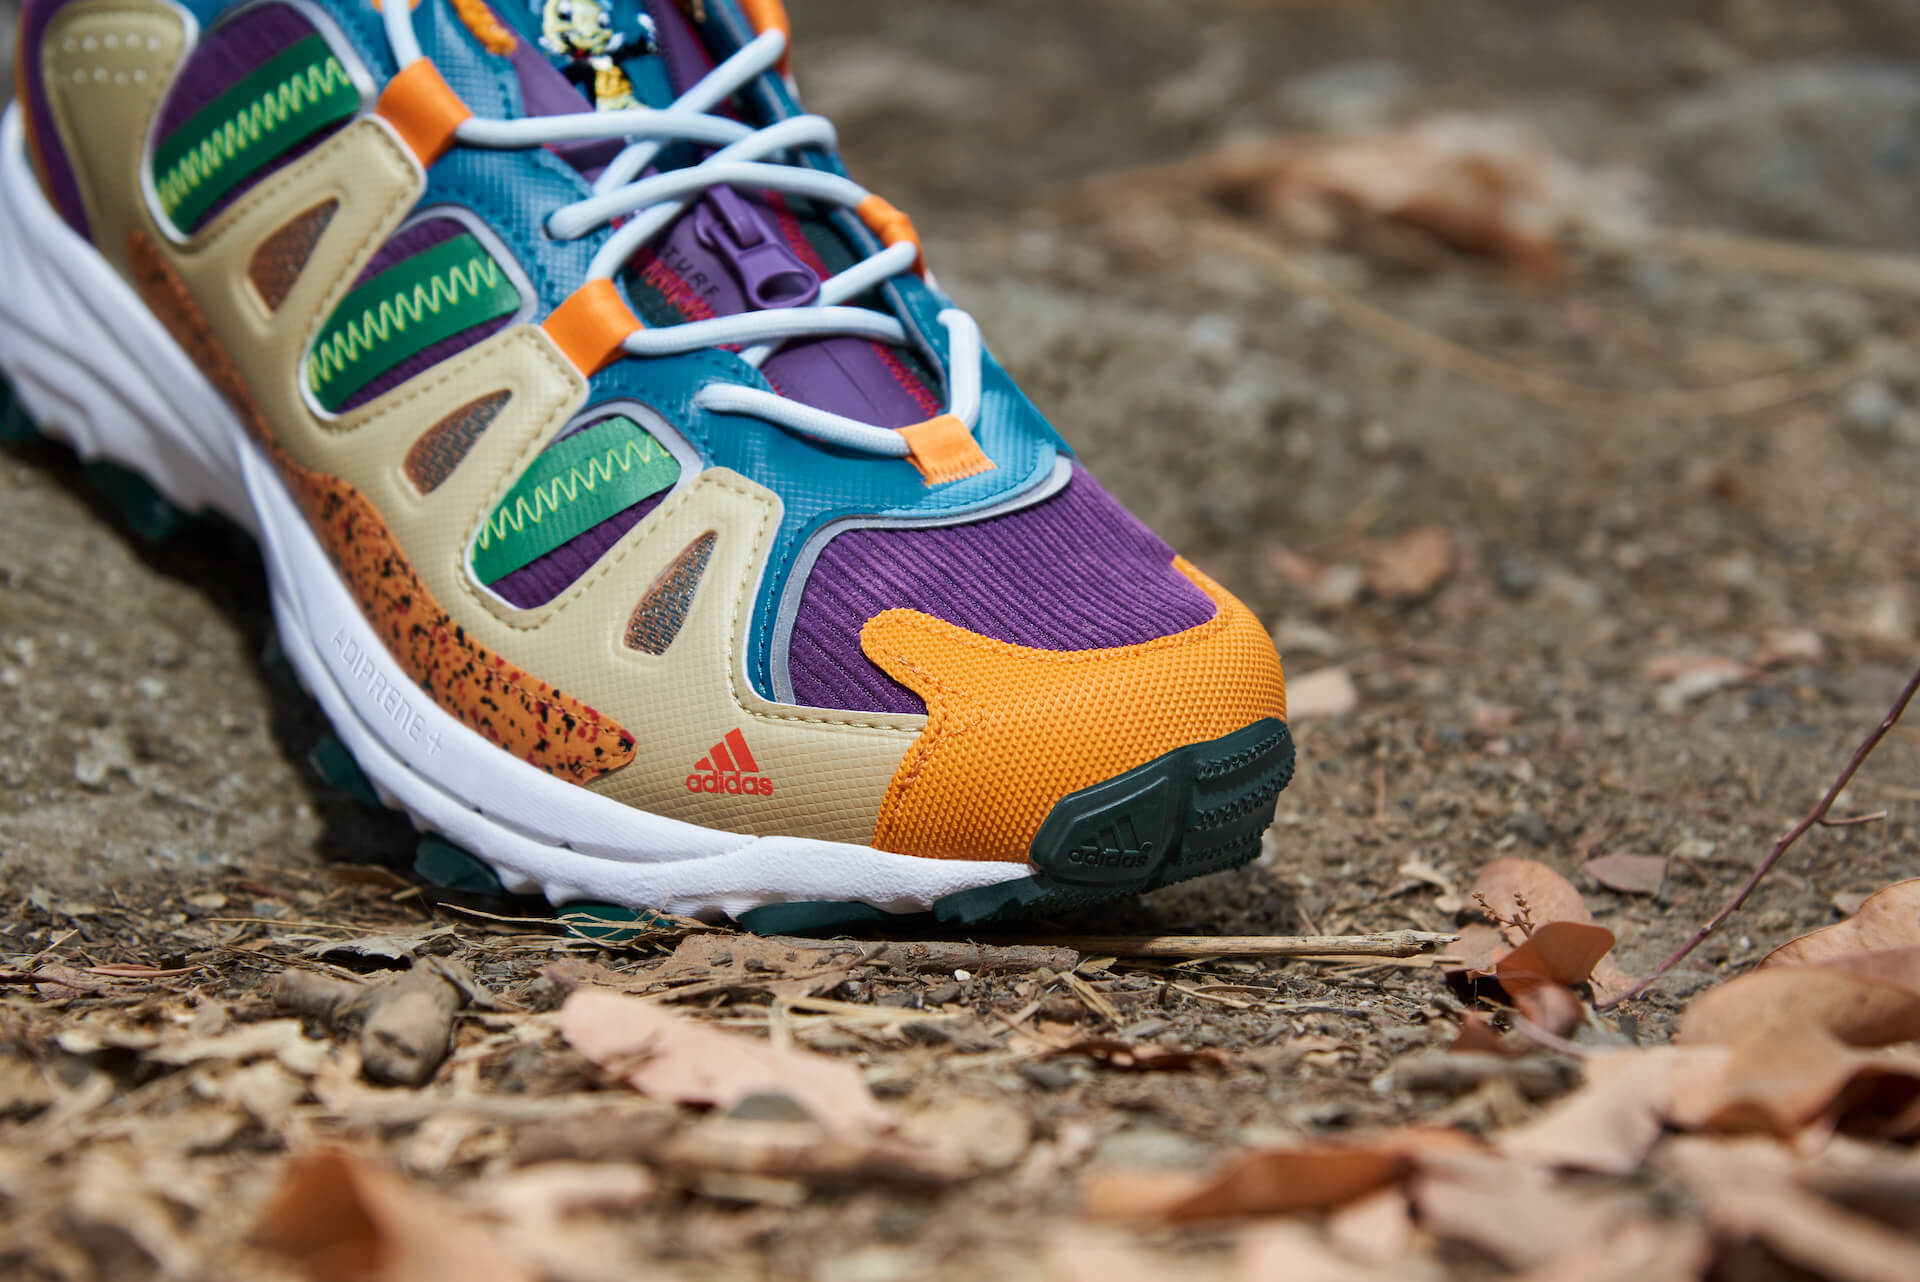 adidas Originalsとショーン・ウェザースプーンの新コラボコレクション「SW SUPERTURF ADVENTURE」が登場! life210921_adidas_sw_5